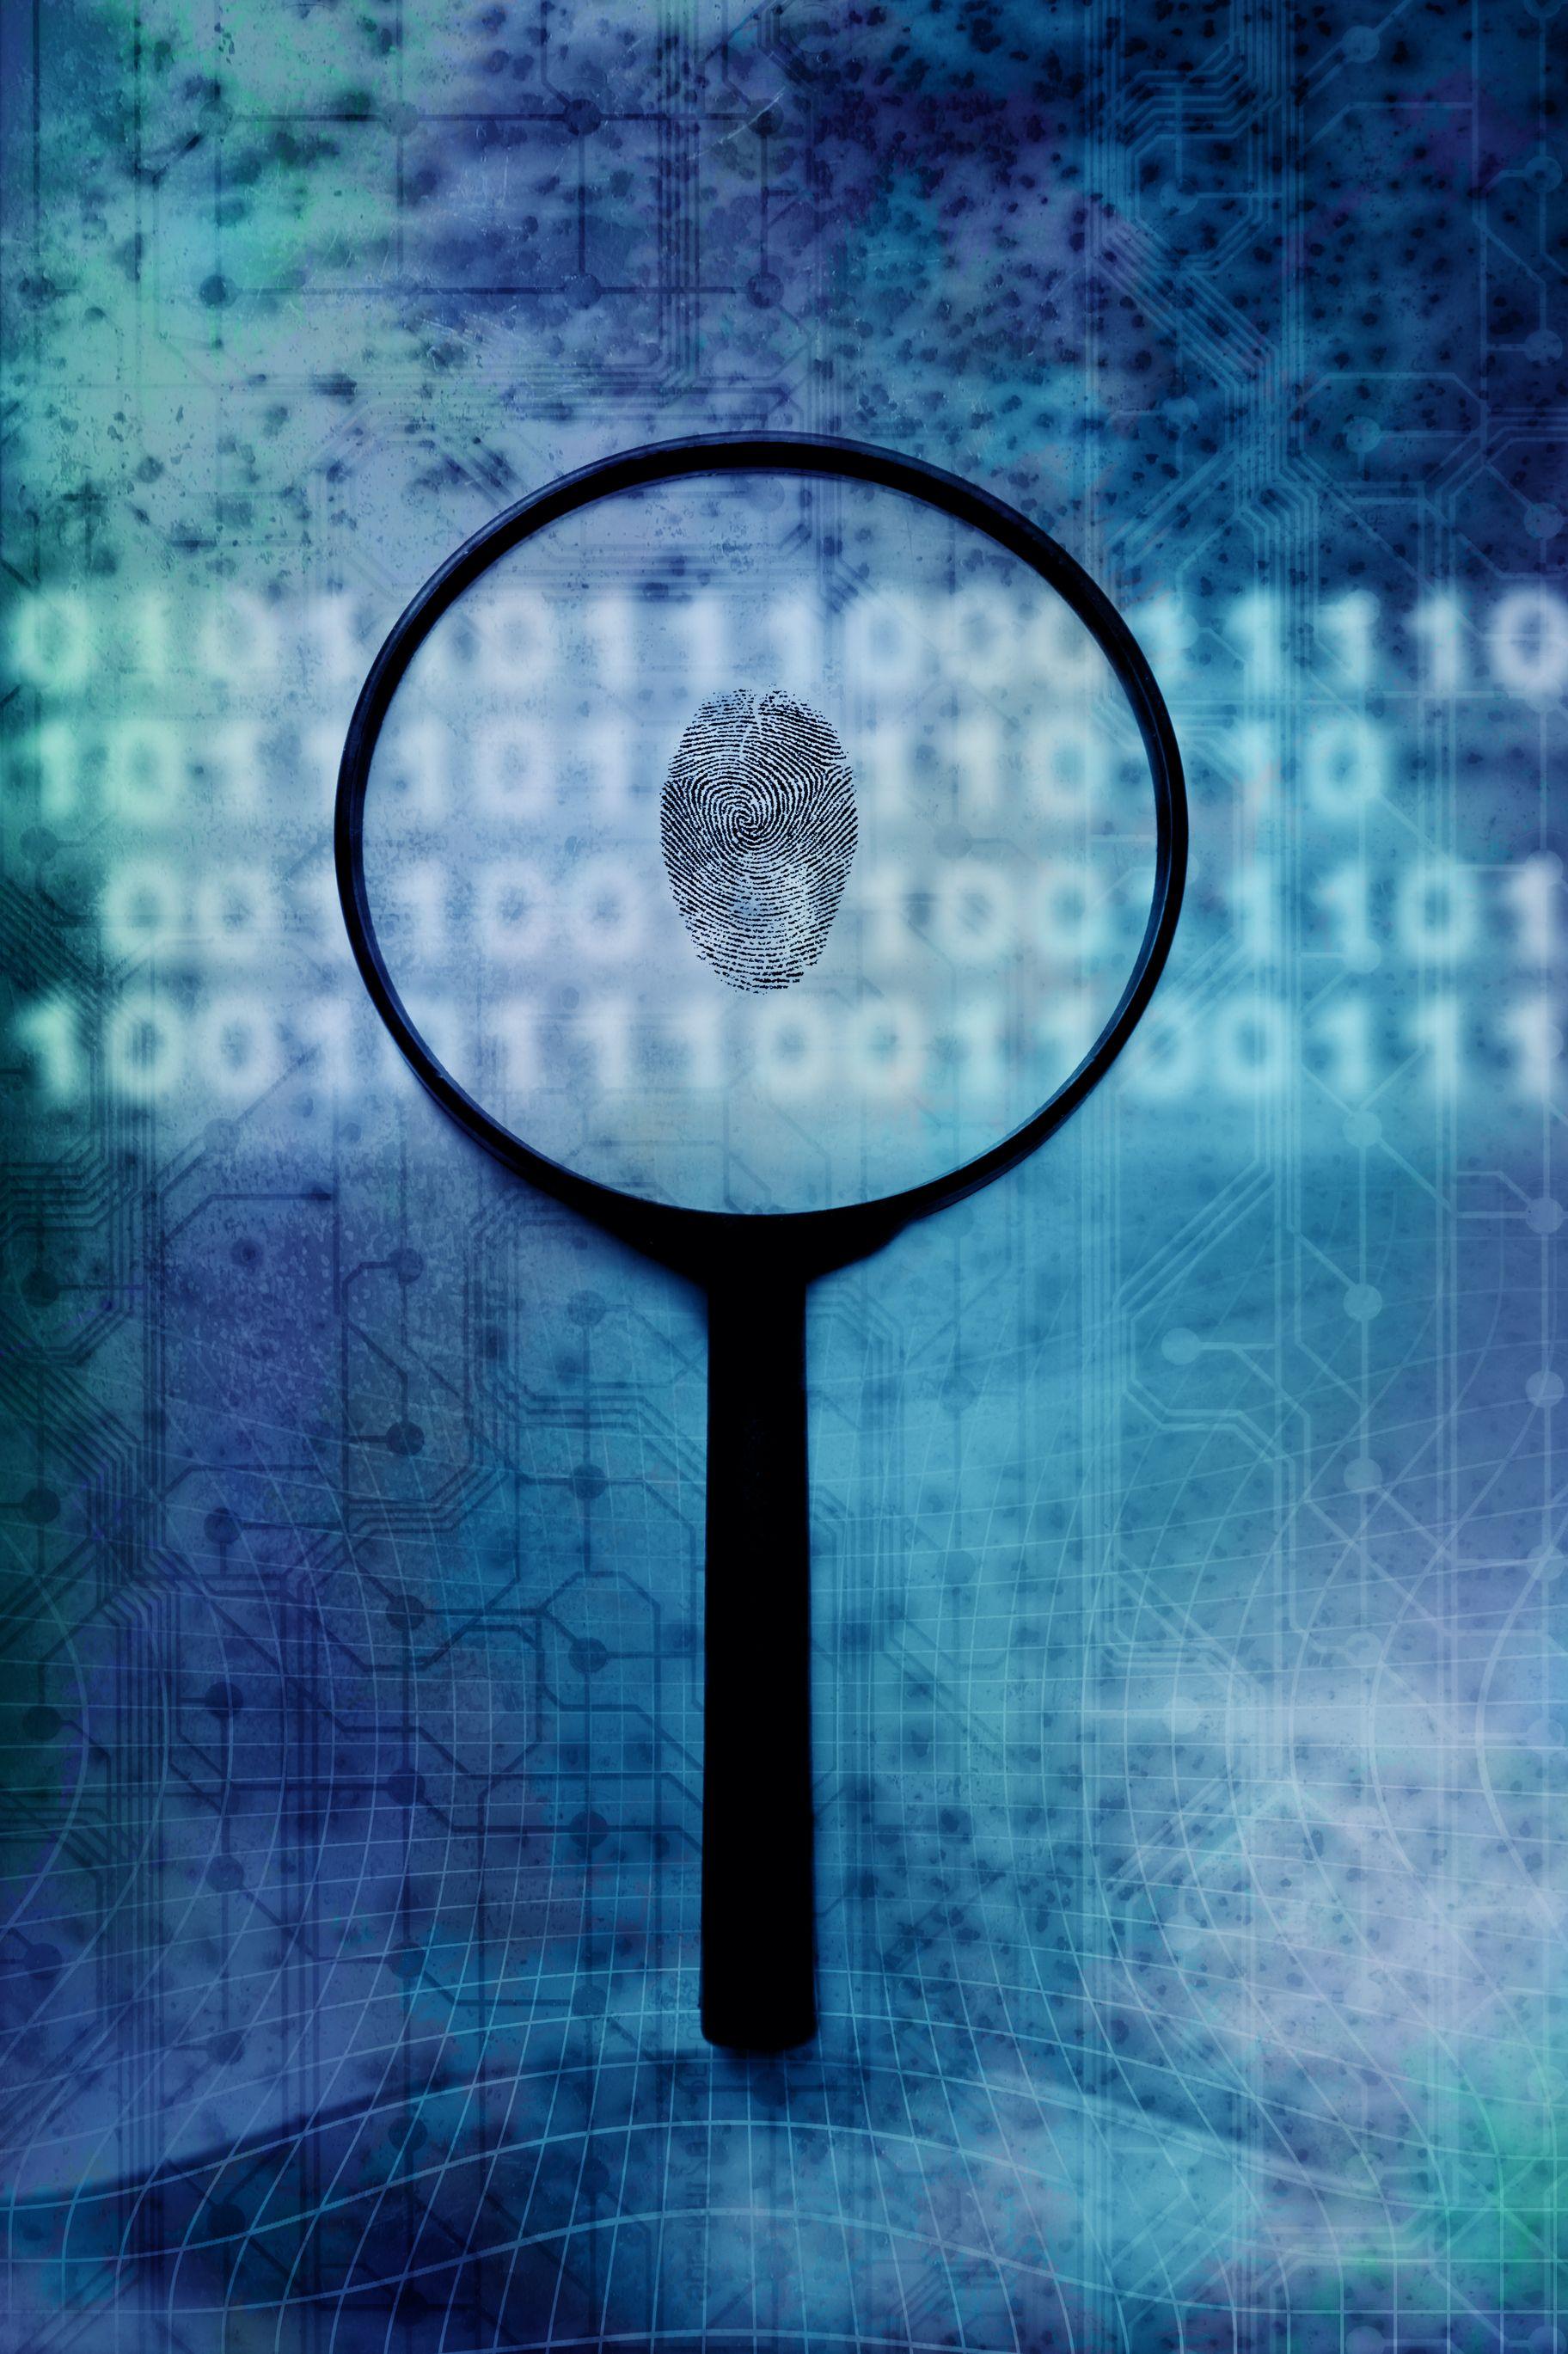 Investigatin internet crime